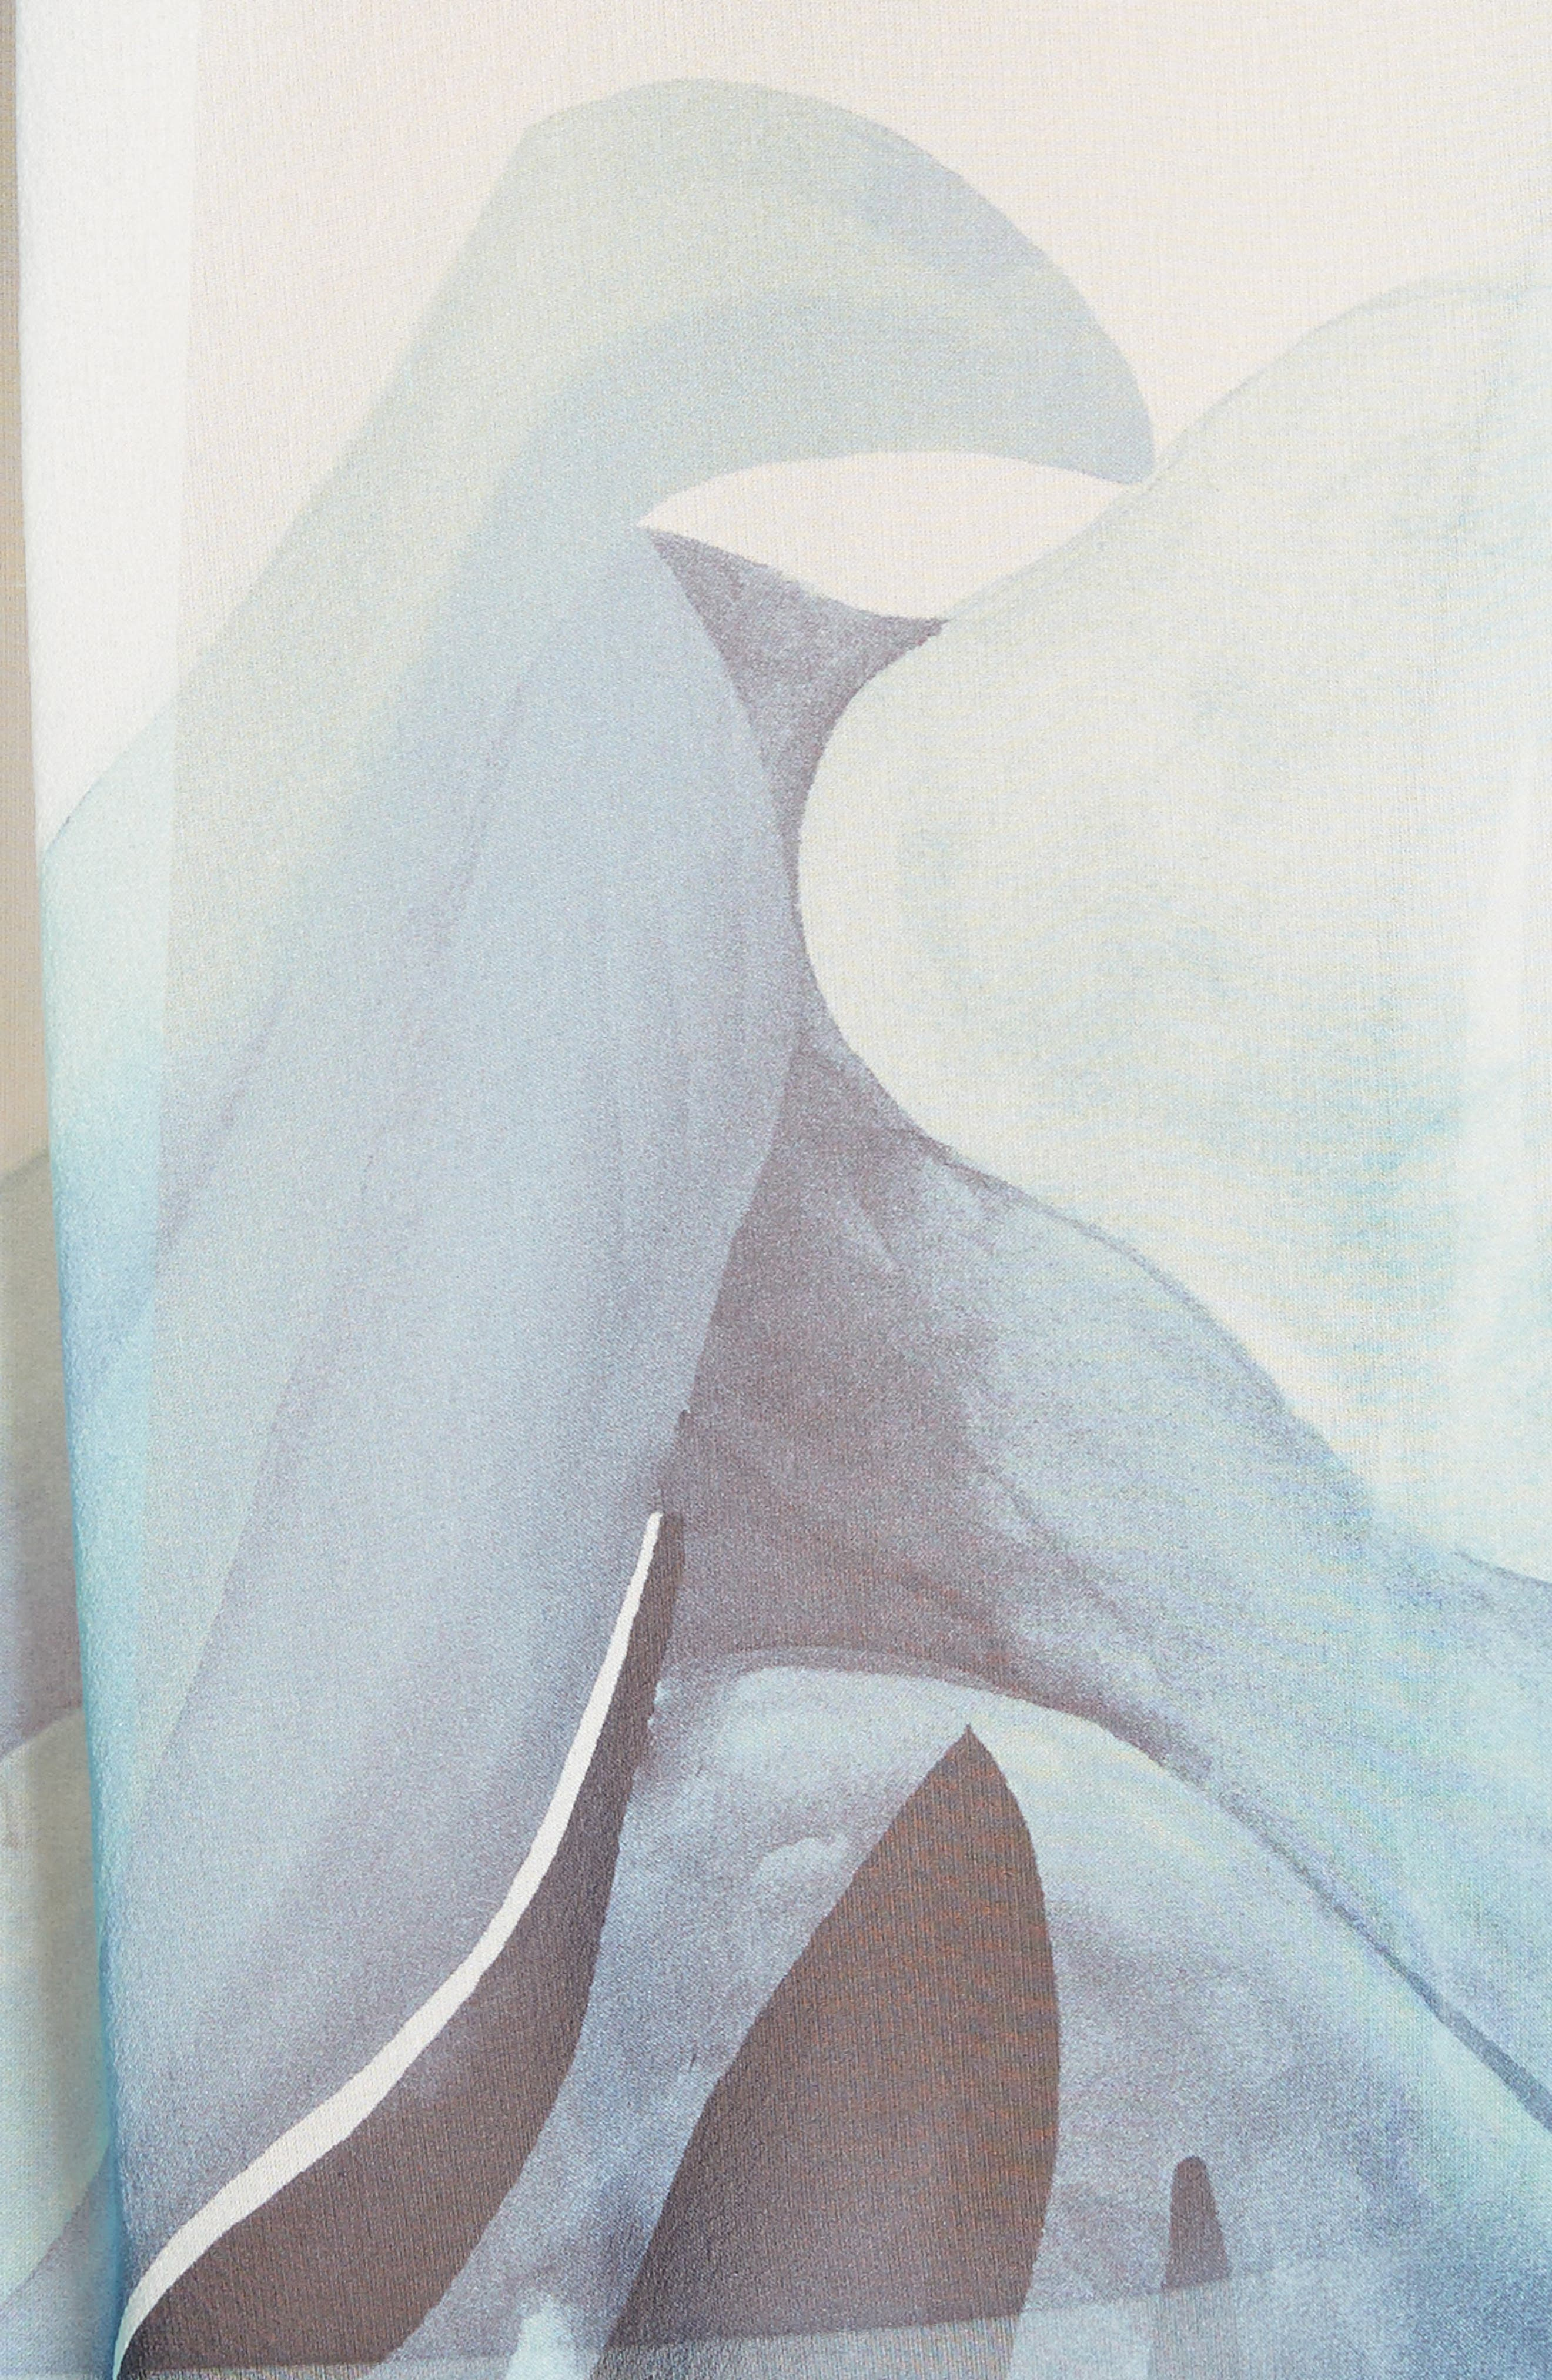 Graydon Print Silk Chiffon Blouse,                             Alternate thumbnail 6, color,                             Herbal Mist Multi